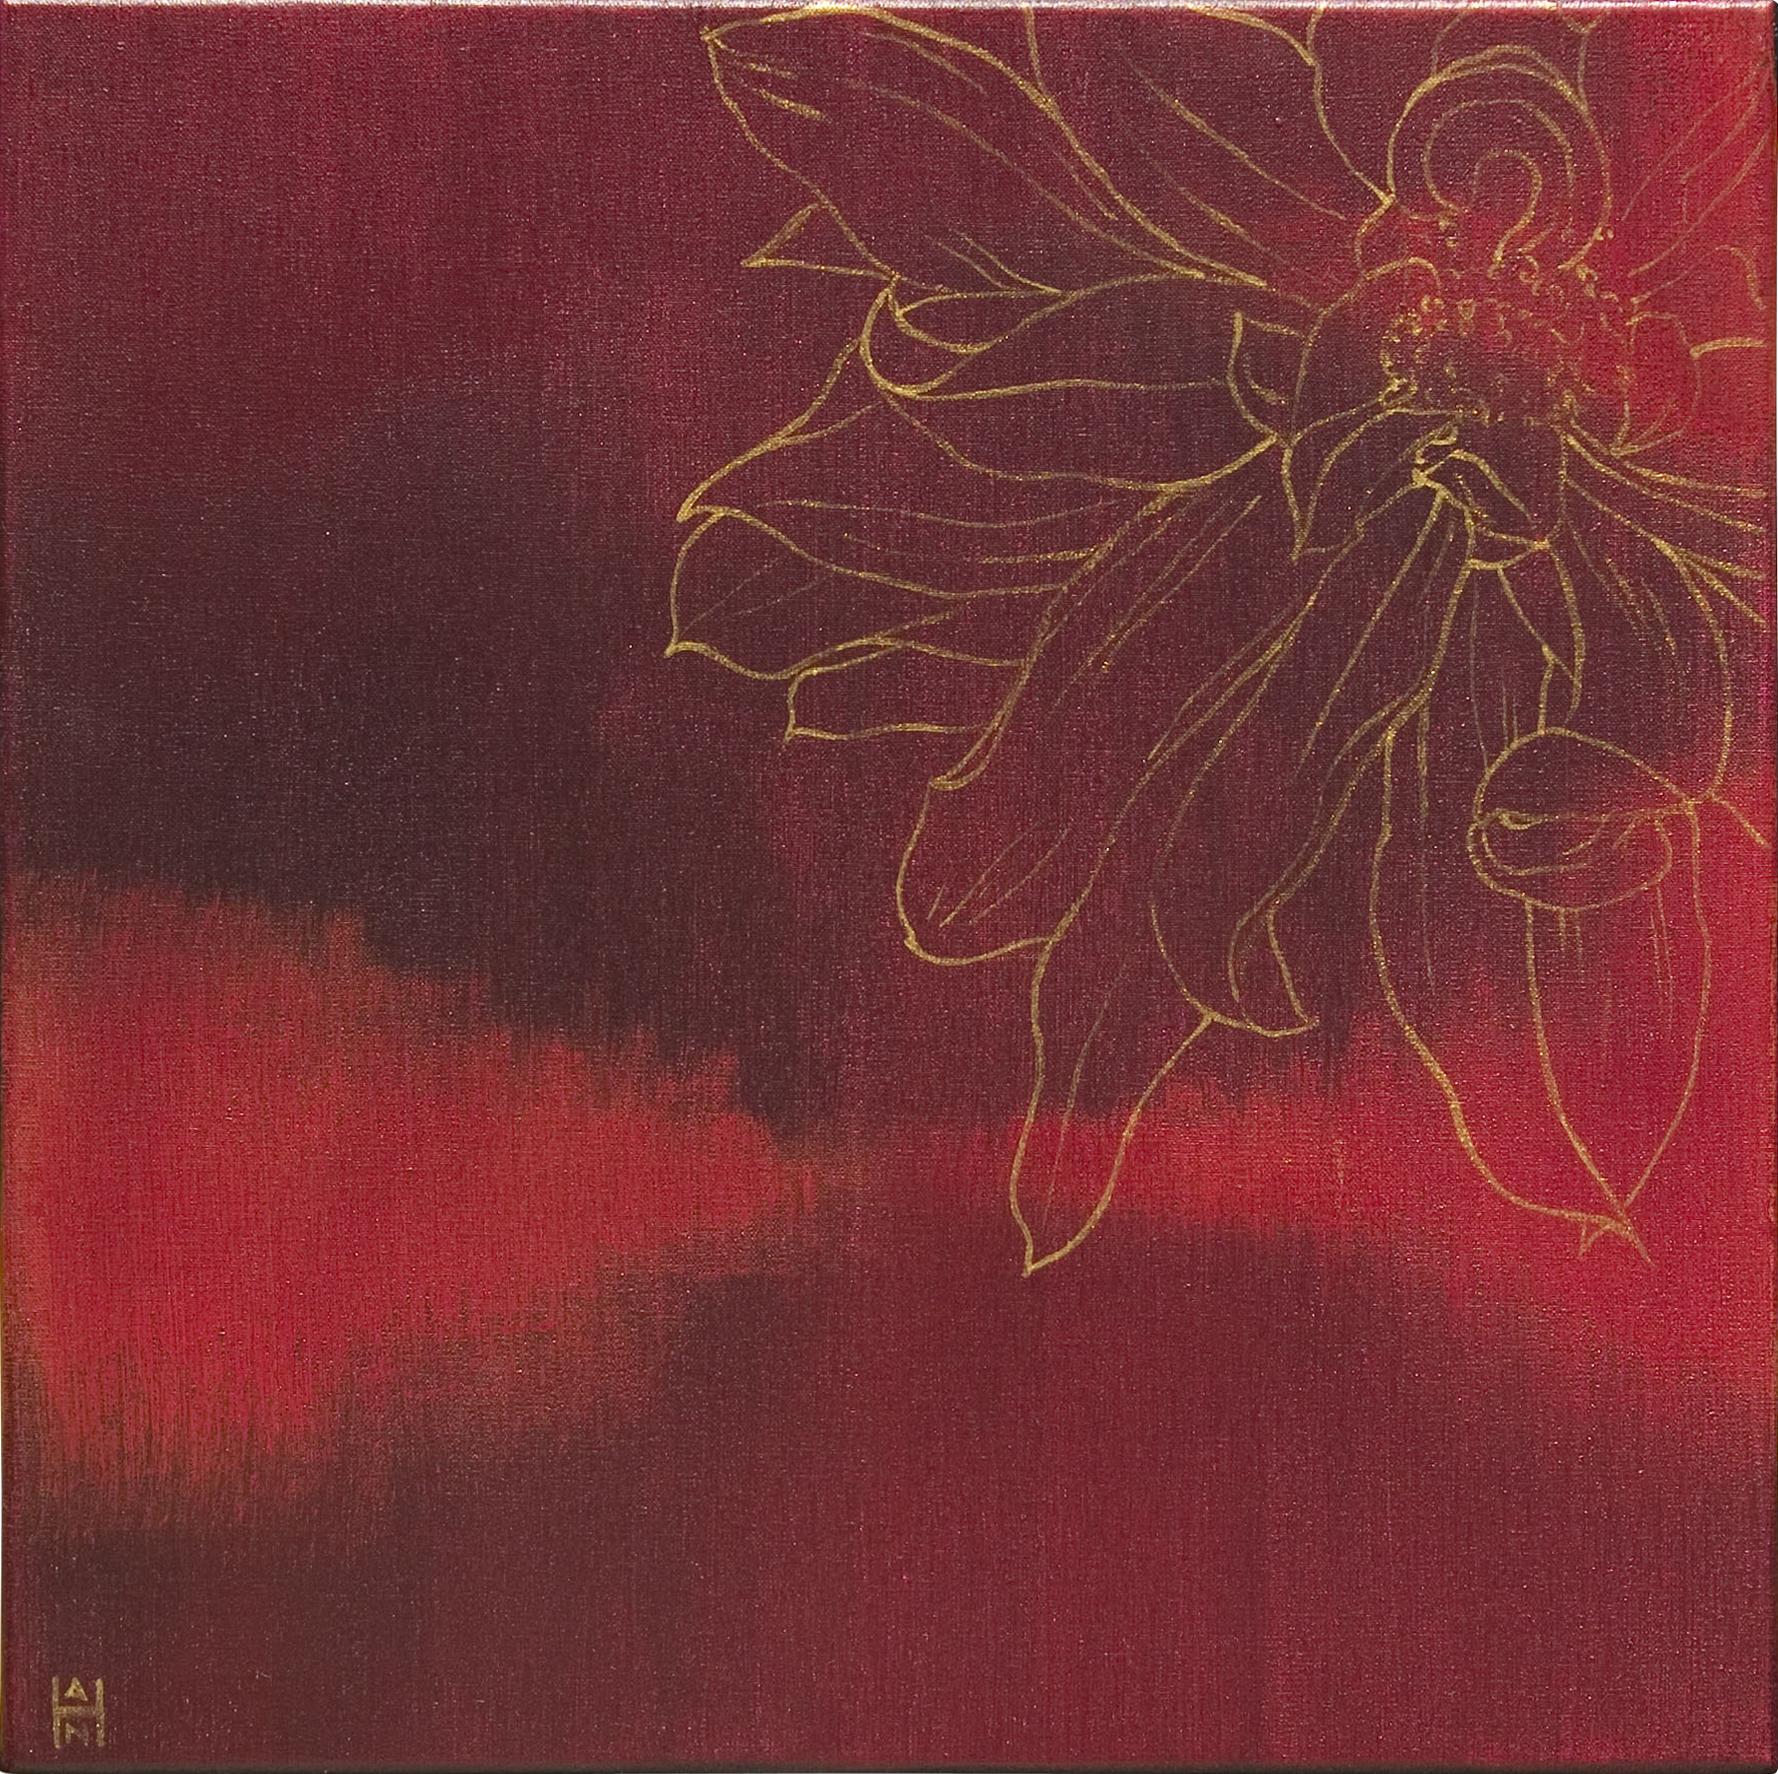 "Solaris 1, acrylic on canvas, 14"" x 14"", $350"